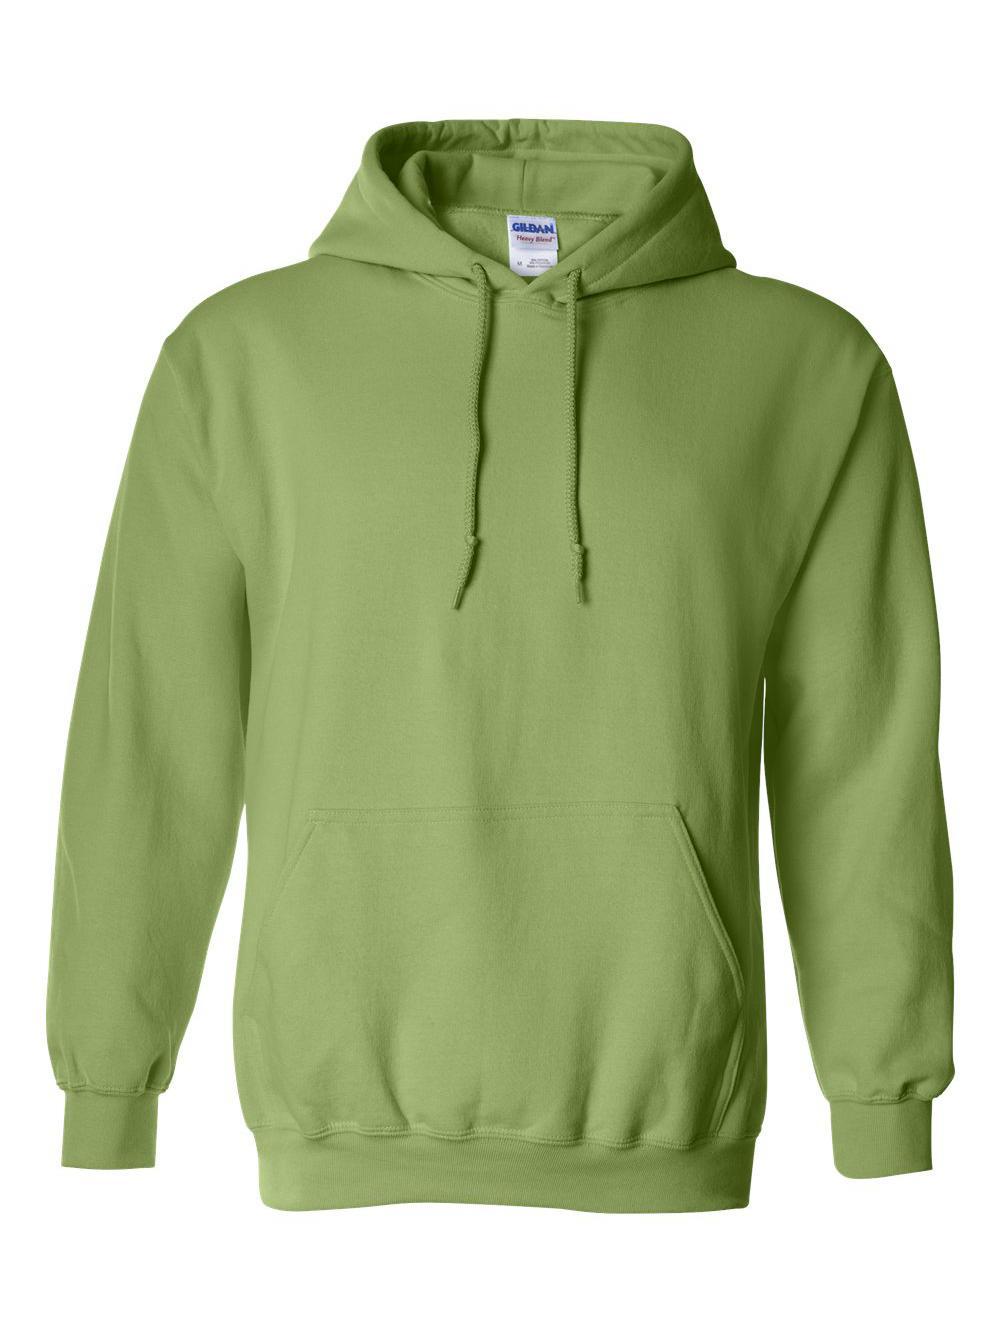 Gildan-Heavy-Blend-Hooded-Sweatshirt-18500 miniatura 69